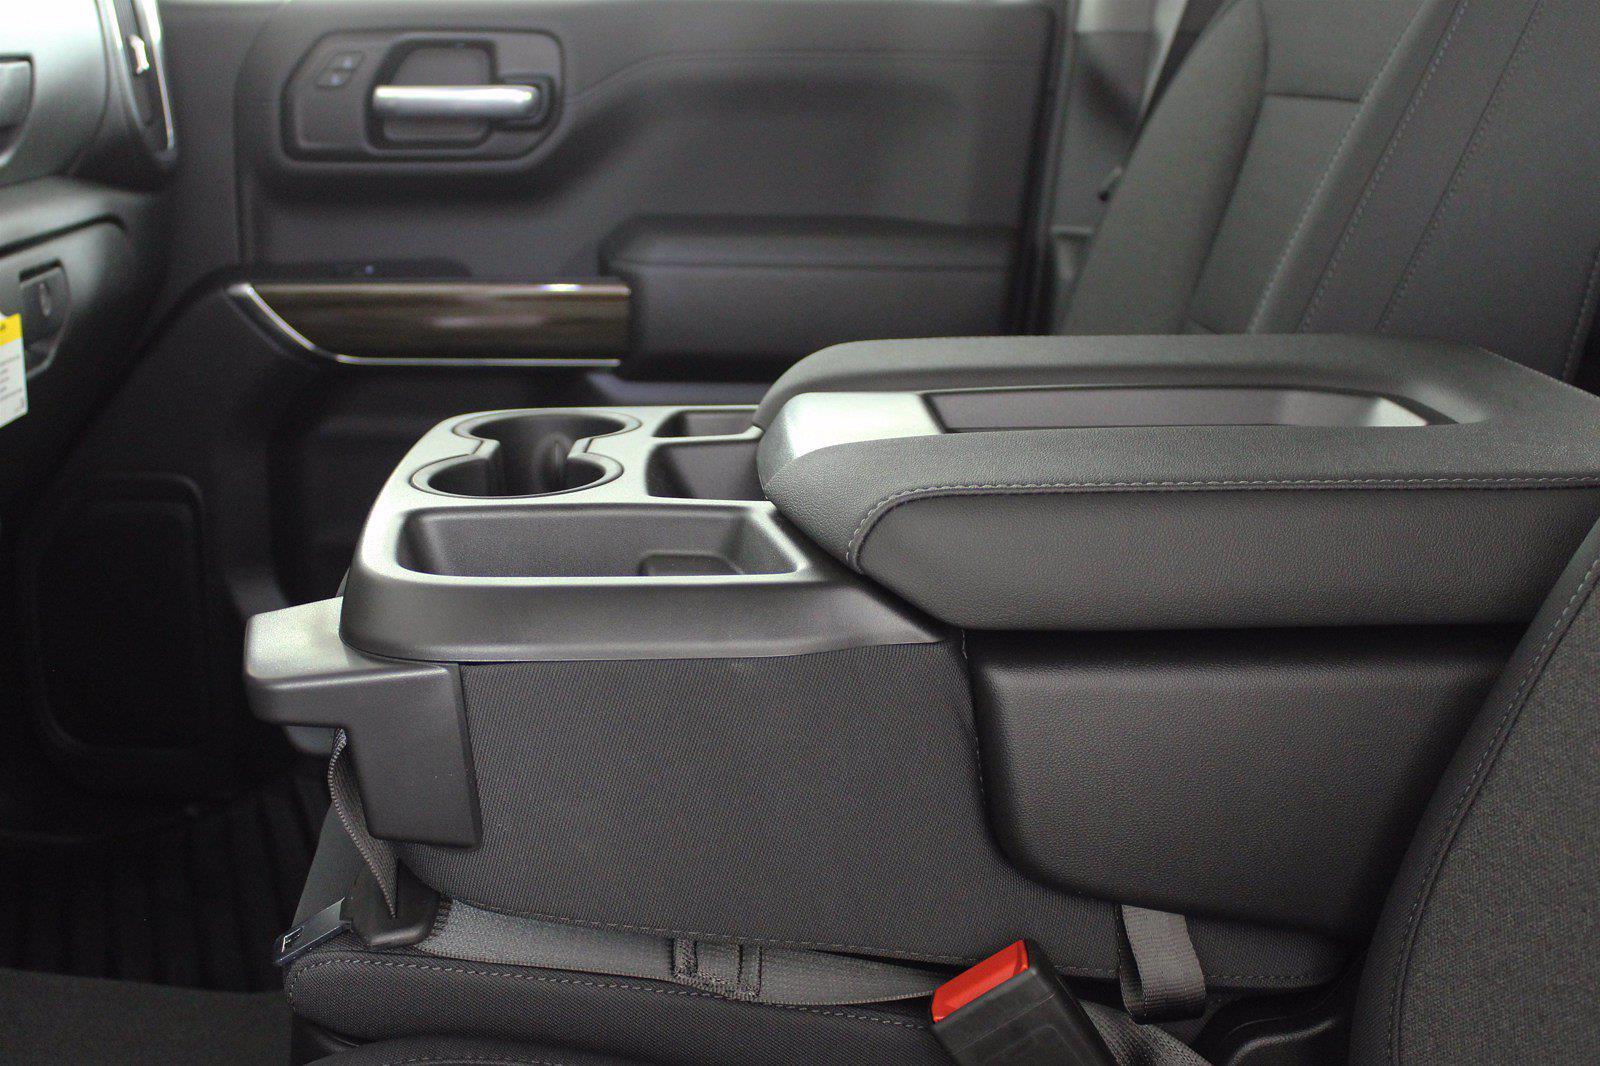 2021 Chevrolet Silverado 1500 Crew Cab 4x4, Pickup #D110819 - photo 13